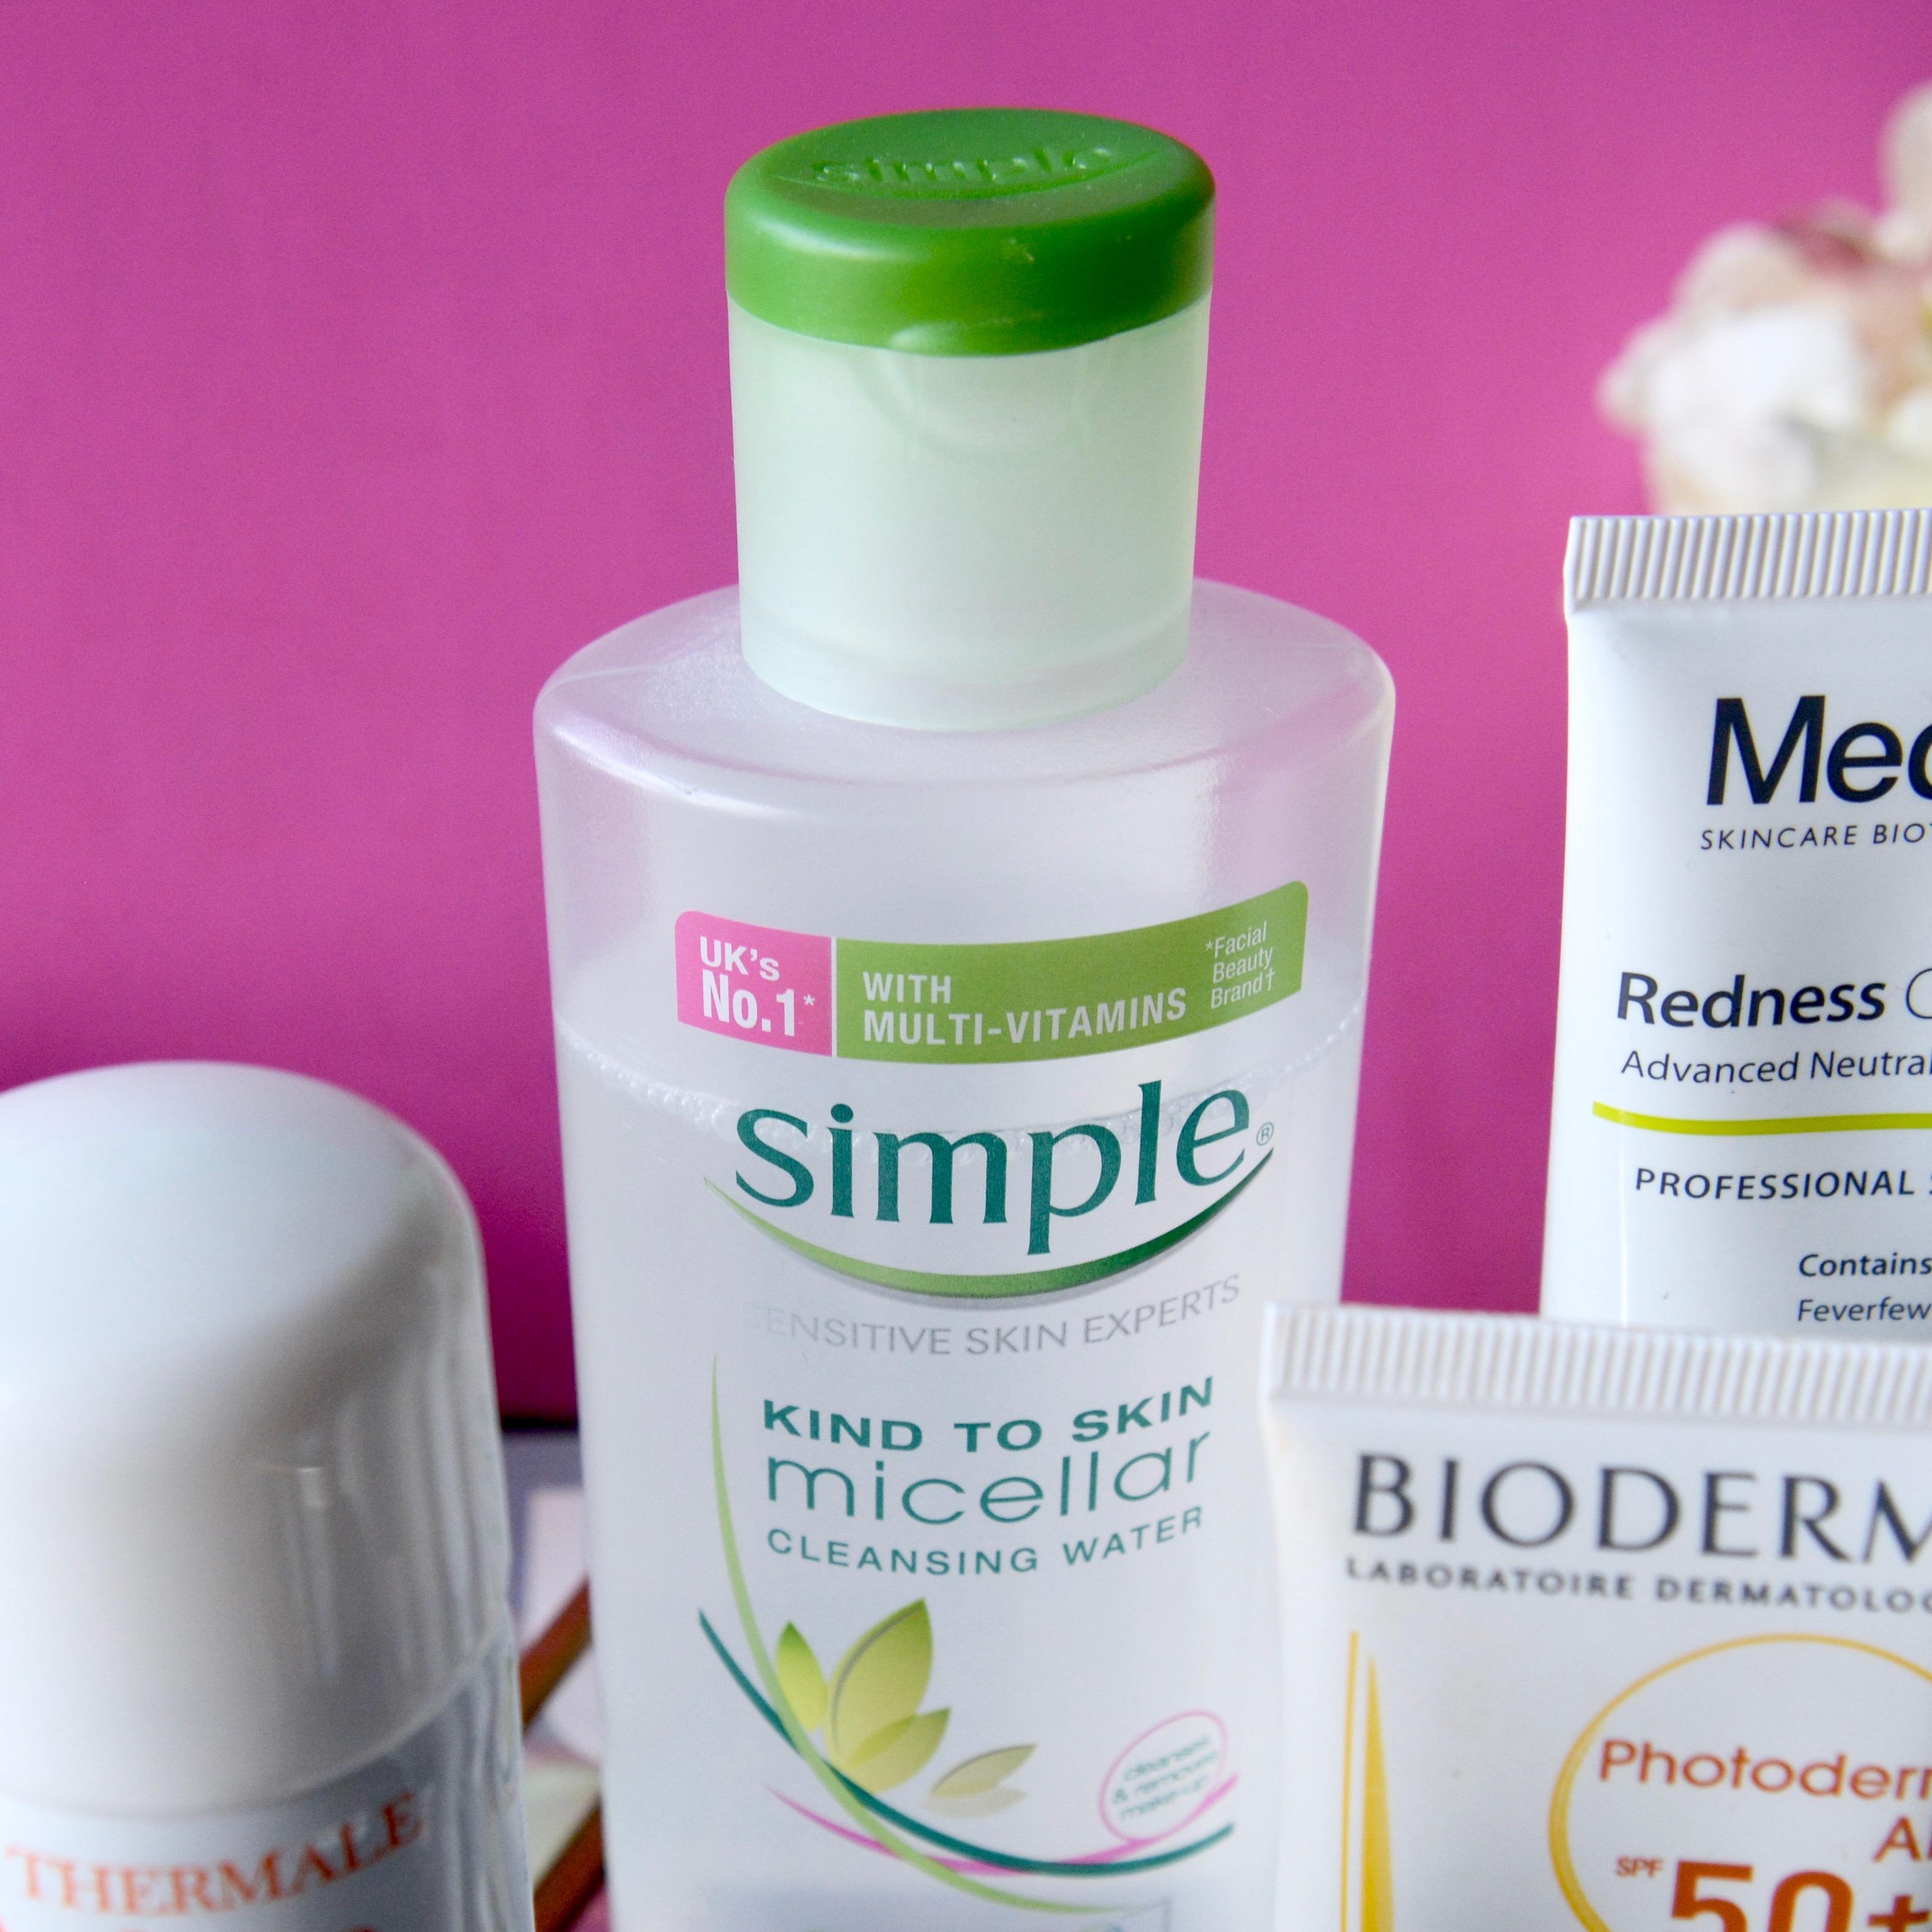 Skincare Shake Up October 2017 - Simple Micellar water (full skincare routine for sensitive/rosacea skin)